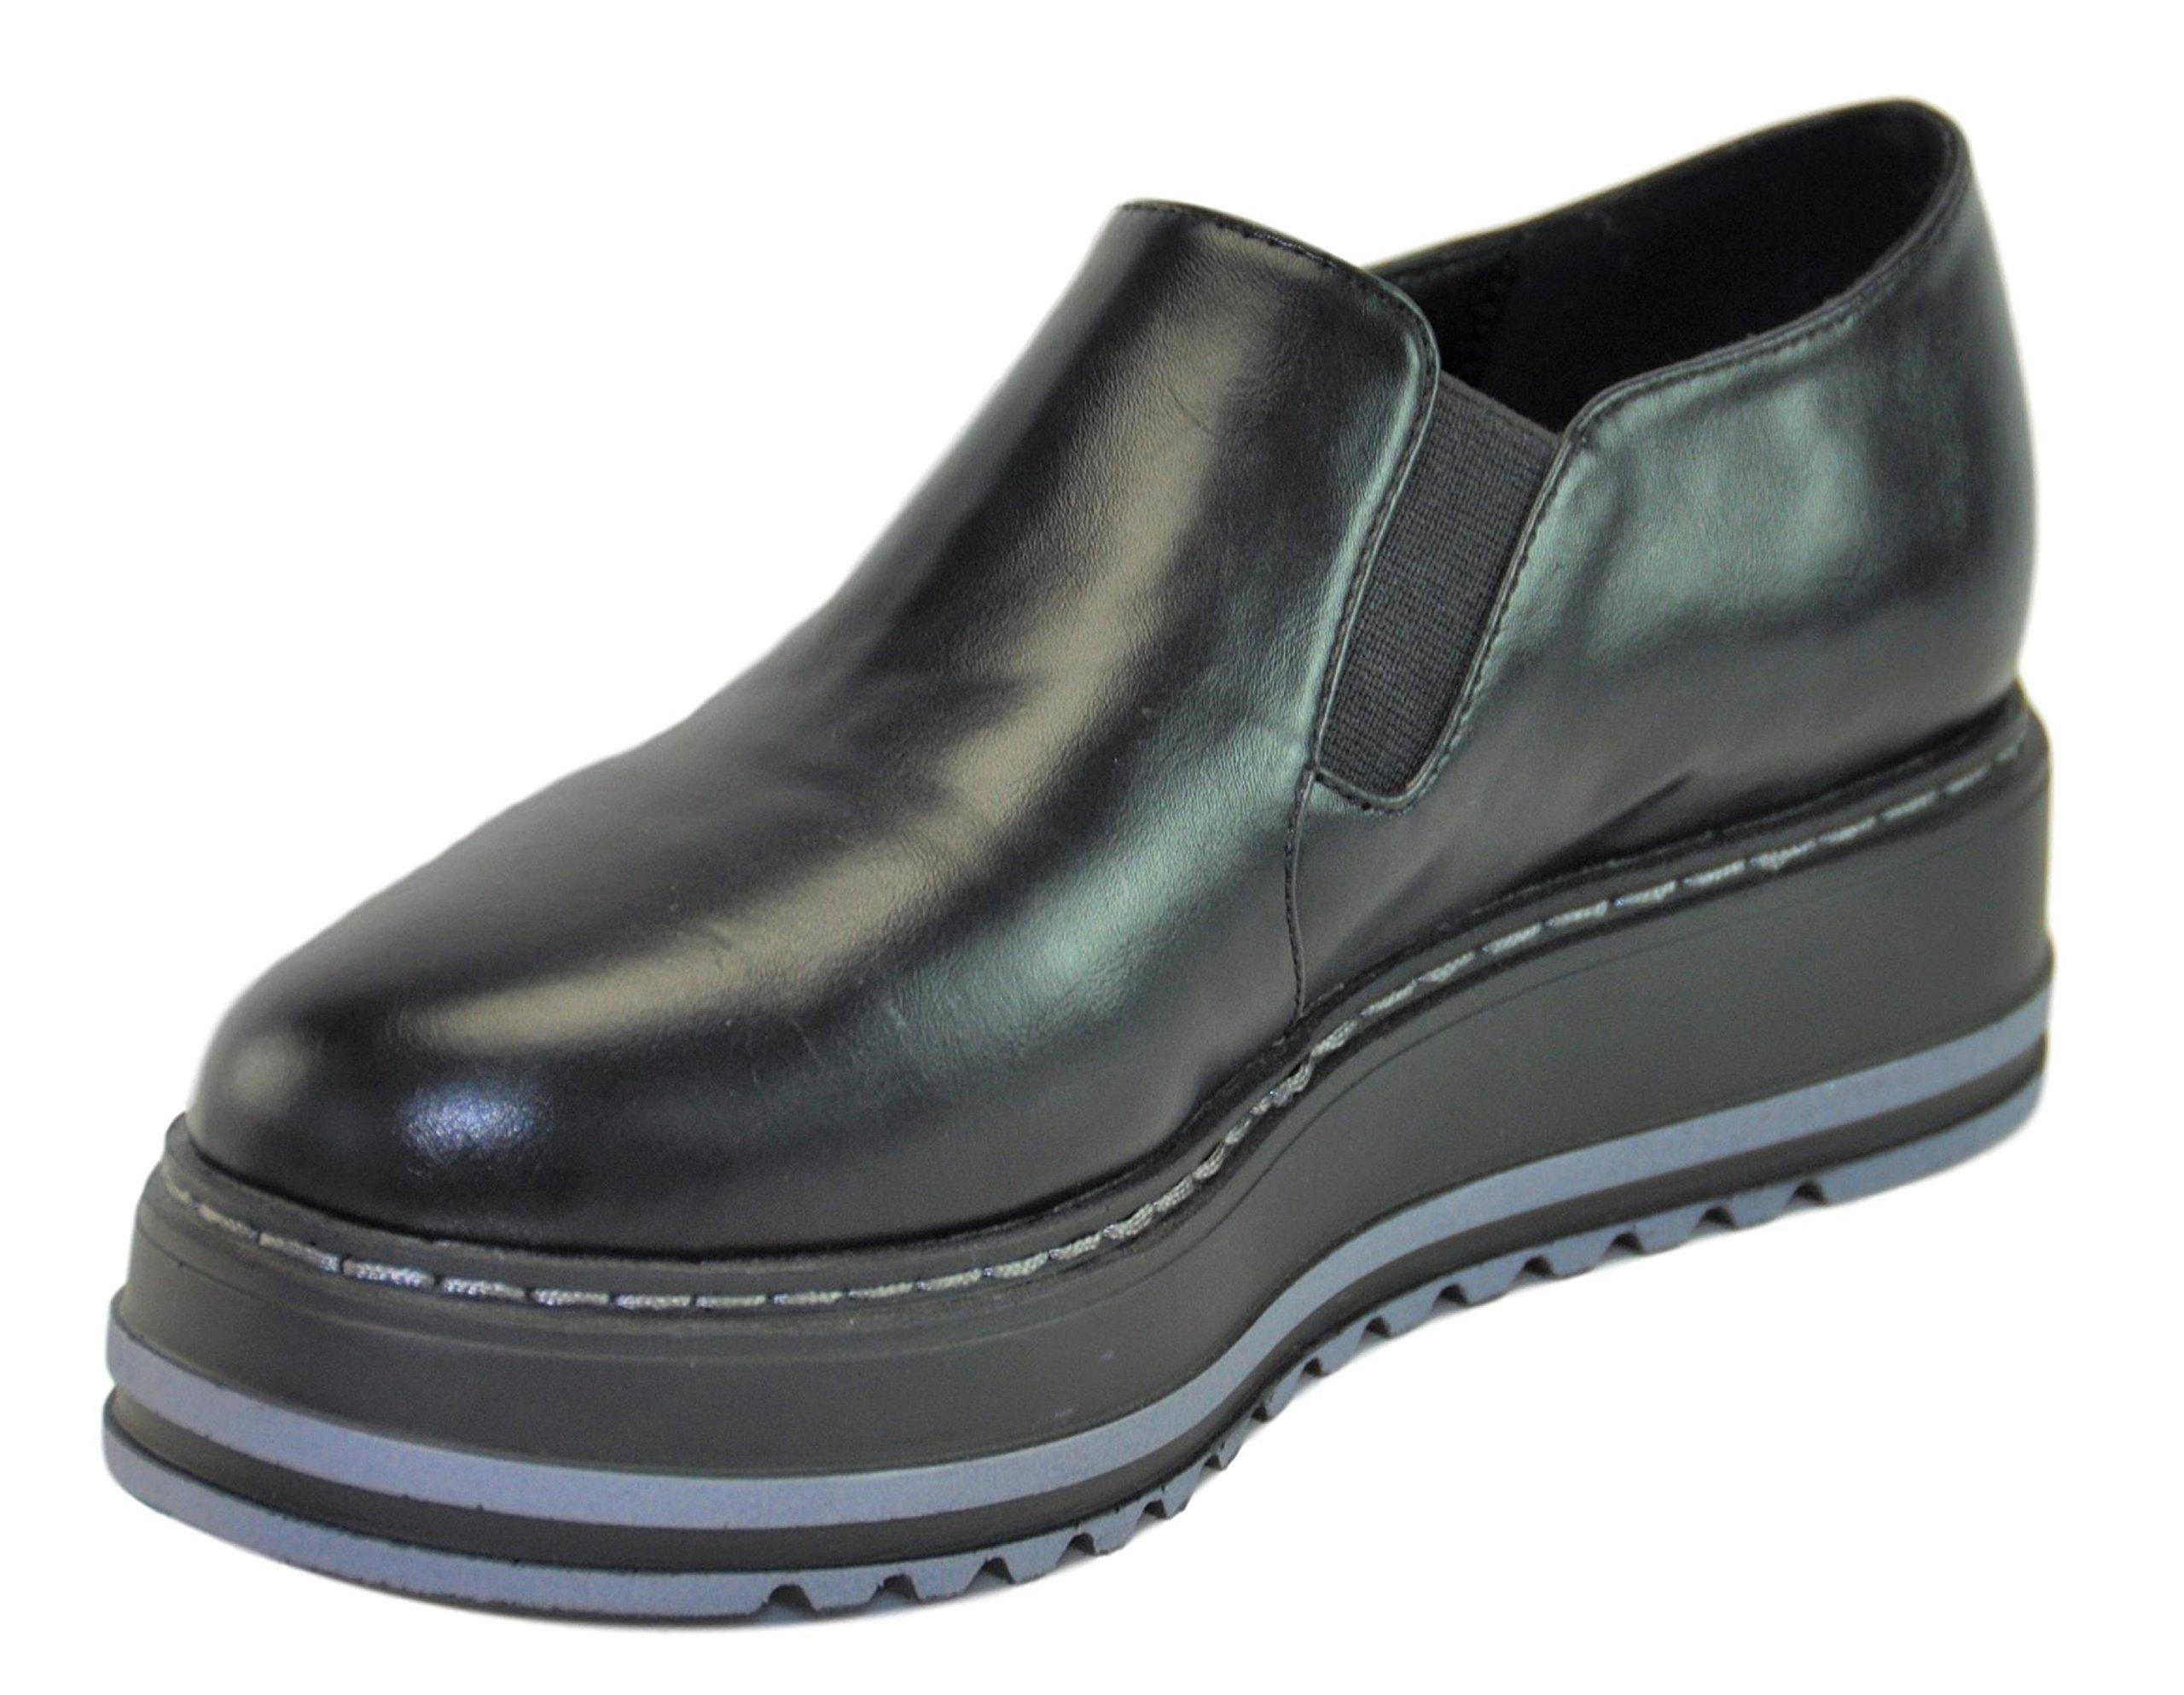 Lynda Black Quality Prime Fashion Slip On Clearance Sale High Heel Creeper Platform Wedge Summer School Oxford Zapatos de Plataforma para Ninas for Youth Teen Girls Women Mujer (Size 5.5, Black) by BDshoes (Image #3)